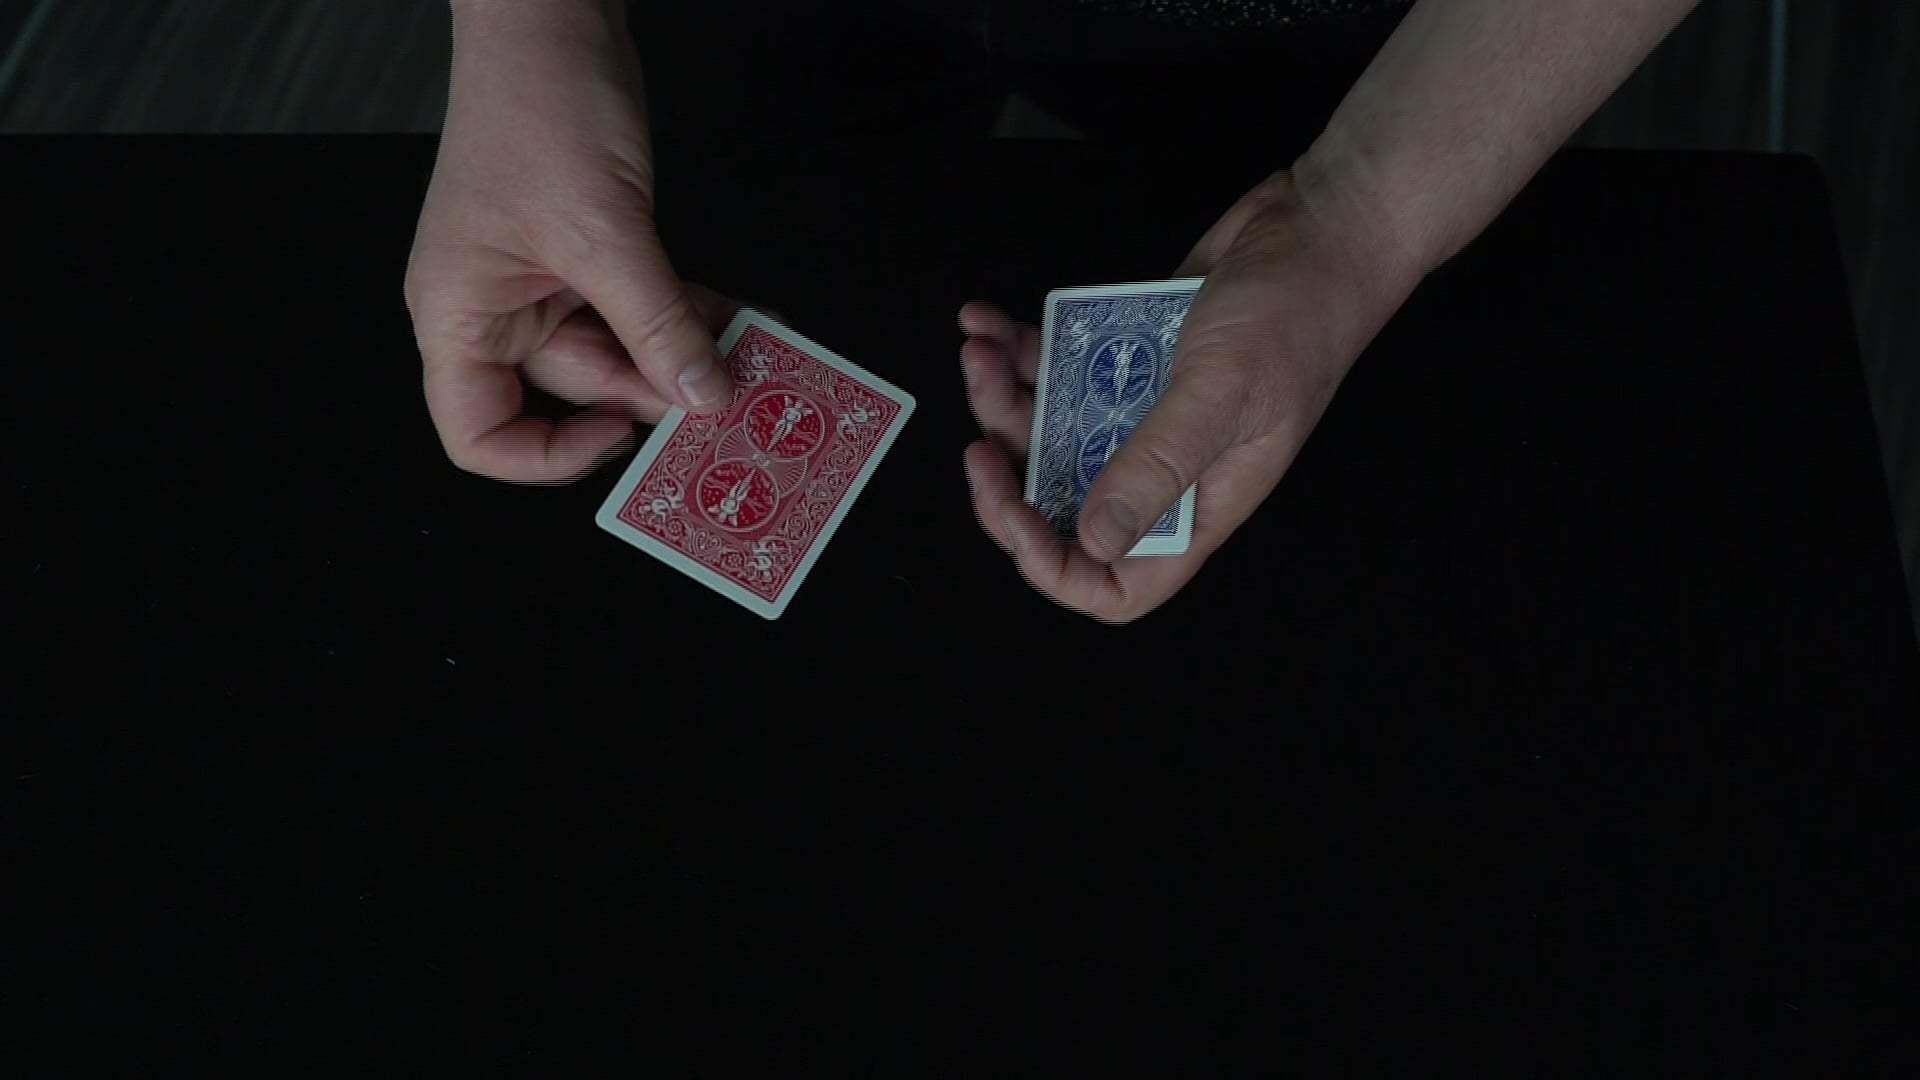 Magic by Martin Tschanett - Aces Trick